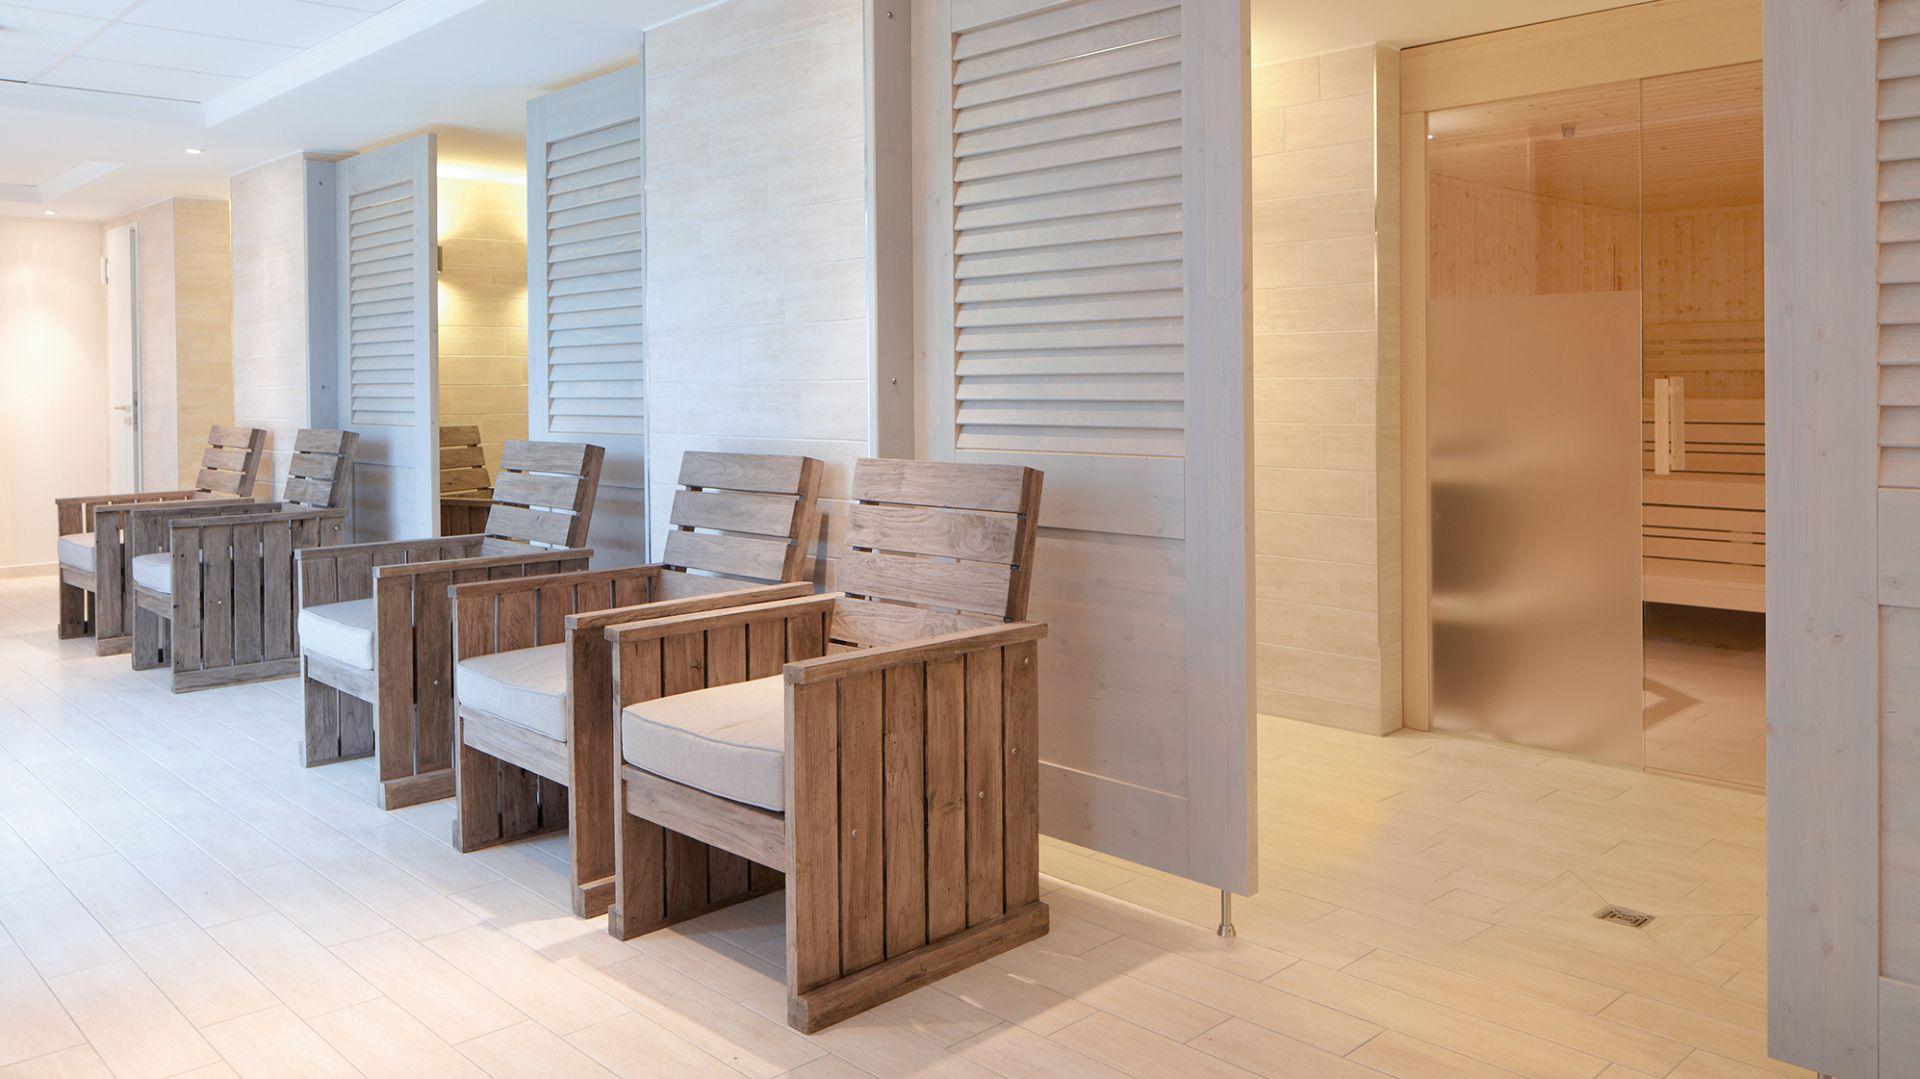 ocean spa im beach motel spo. Black Bedroom Furniture Sets. Home Design Ideas